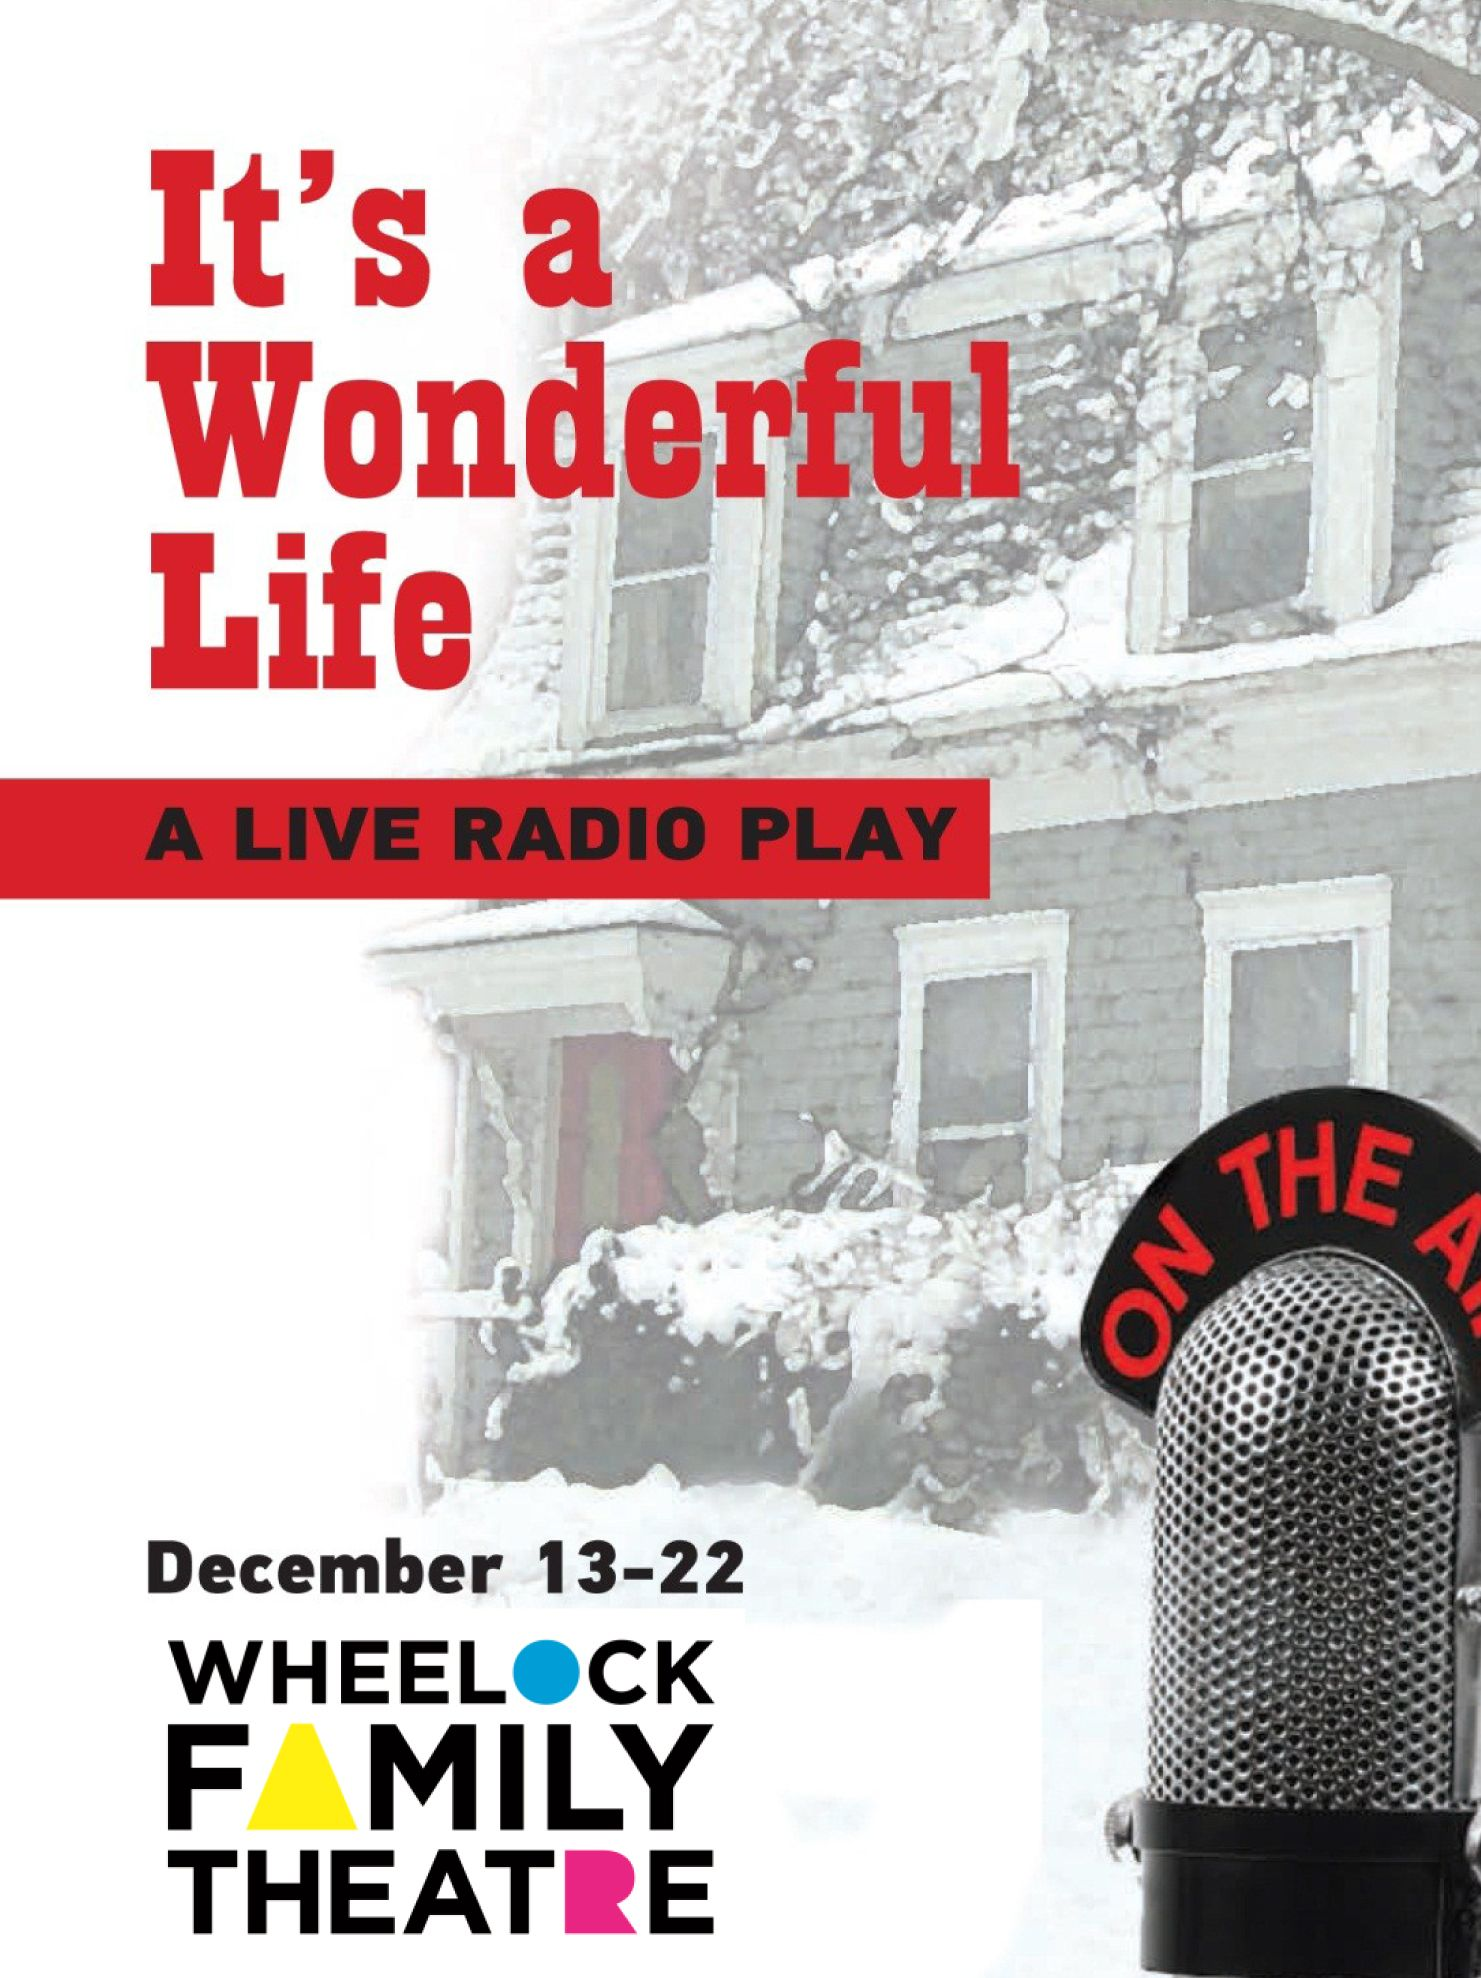 """It's A Wonderful Life, A Live Radio Play"" December 13 - 22, 2013"